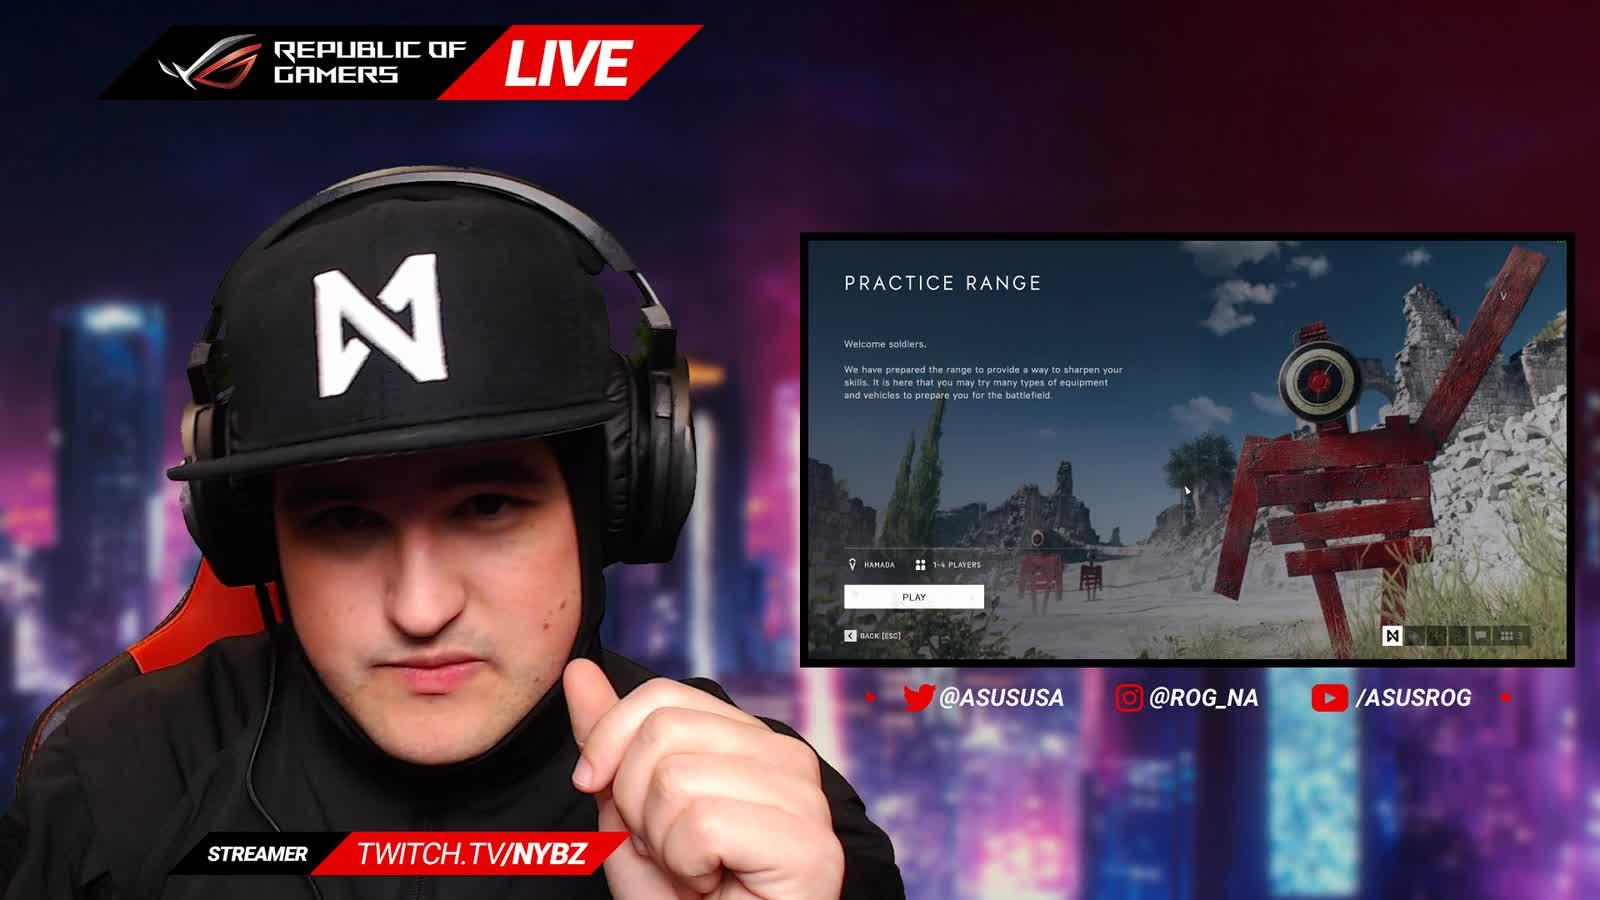 ASUSROG - ROG LIVE | #RTX ON - Battlefield V with Nybz - Twitch